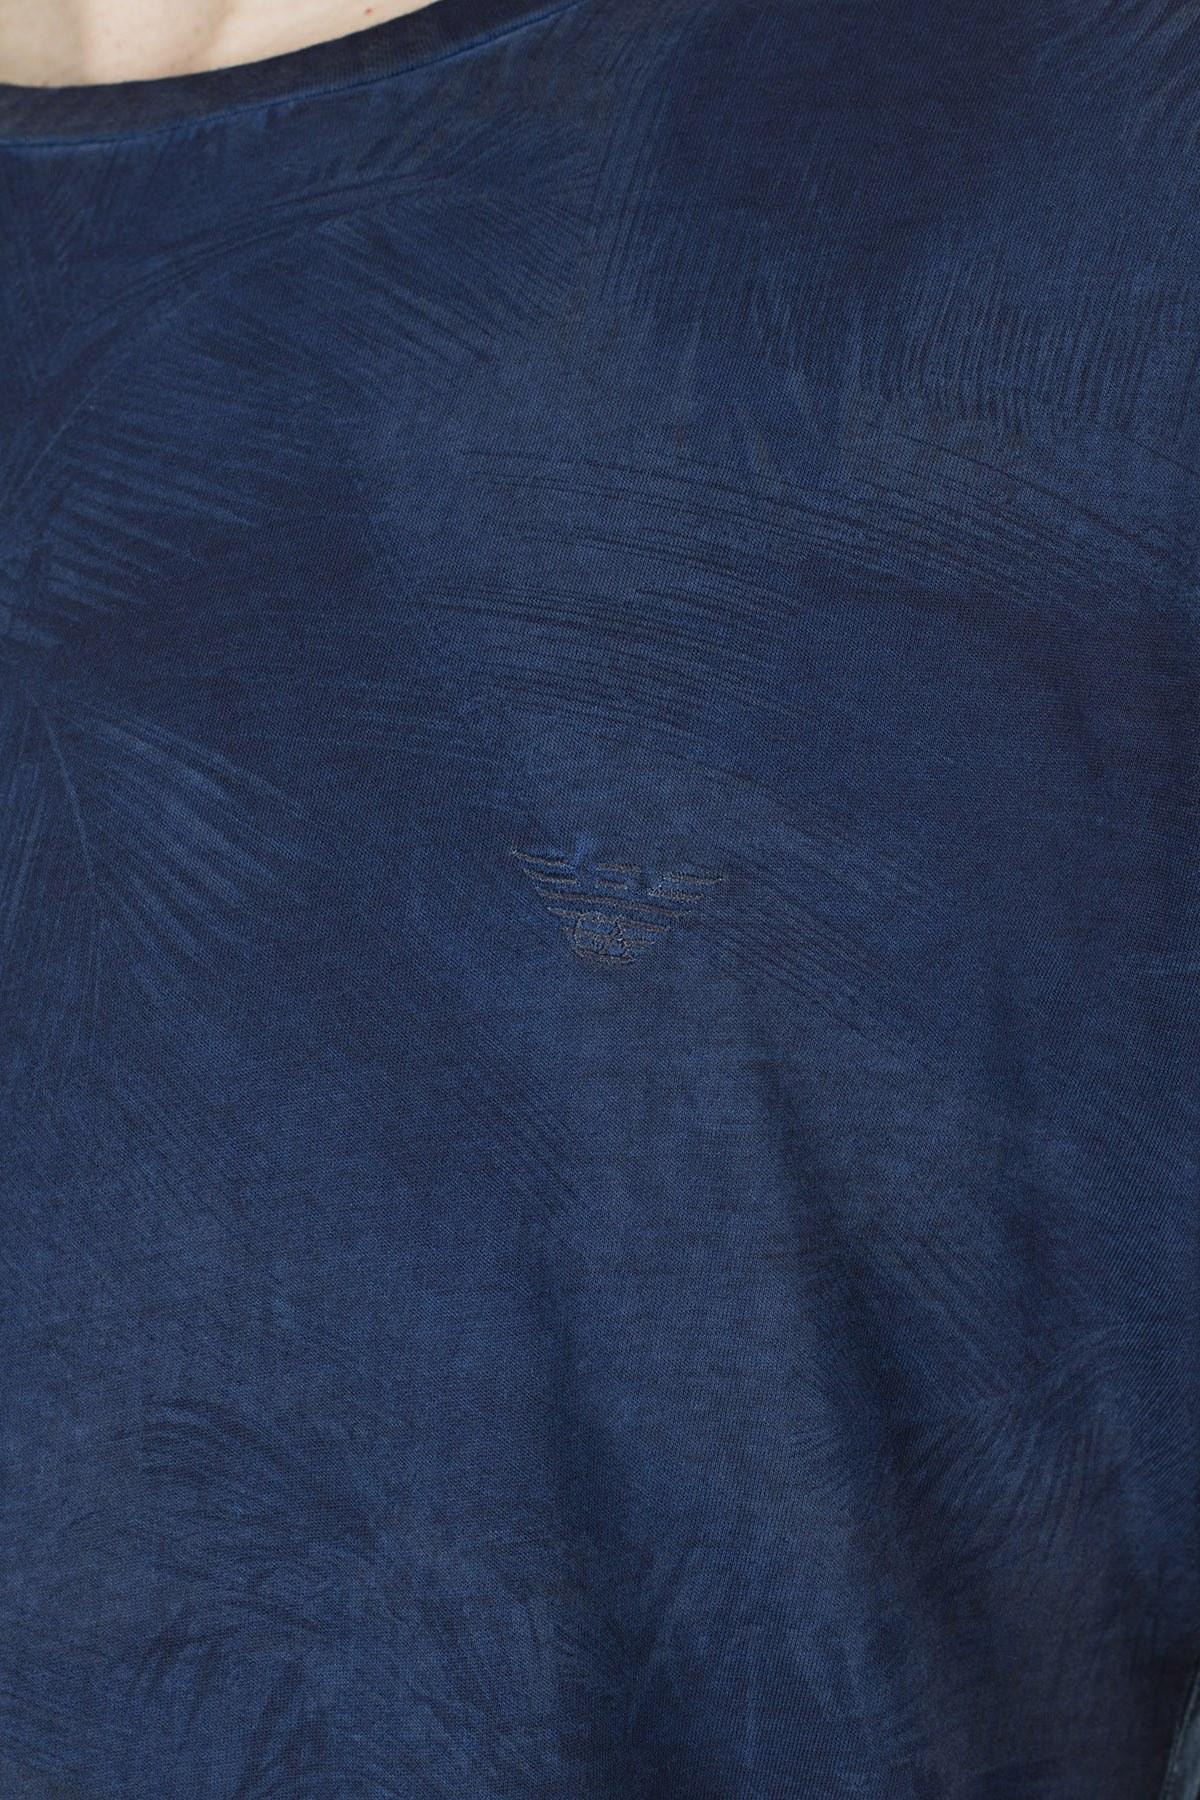 Emporio Armani Erkek T Shirt 211831 0P467 65335 LACİVERT